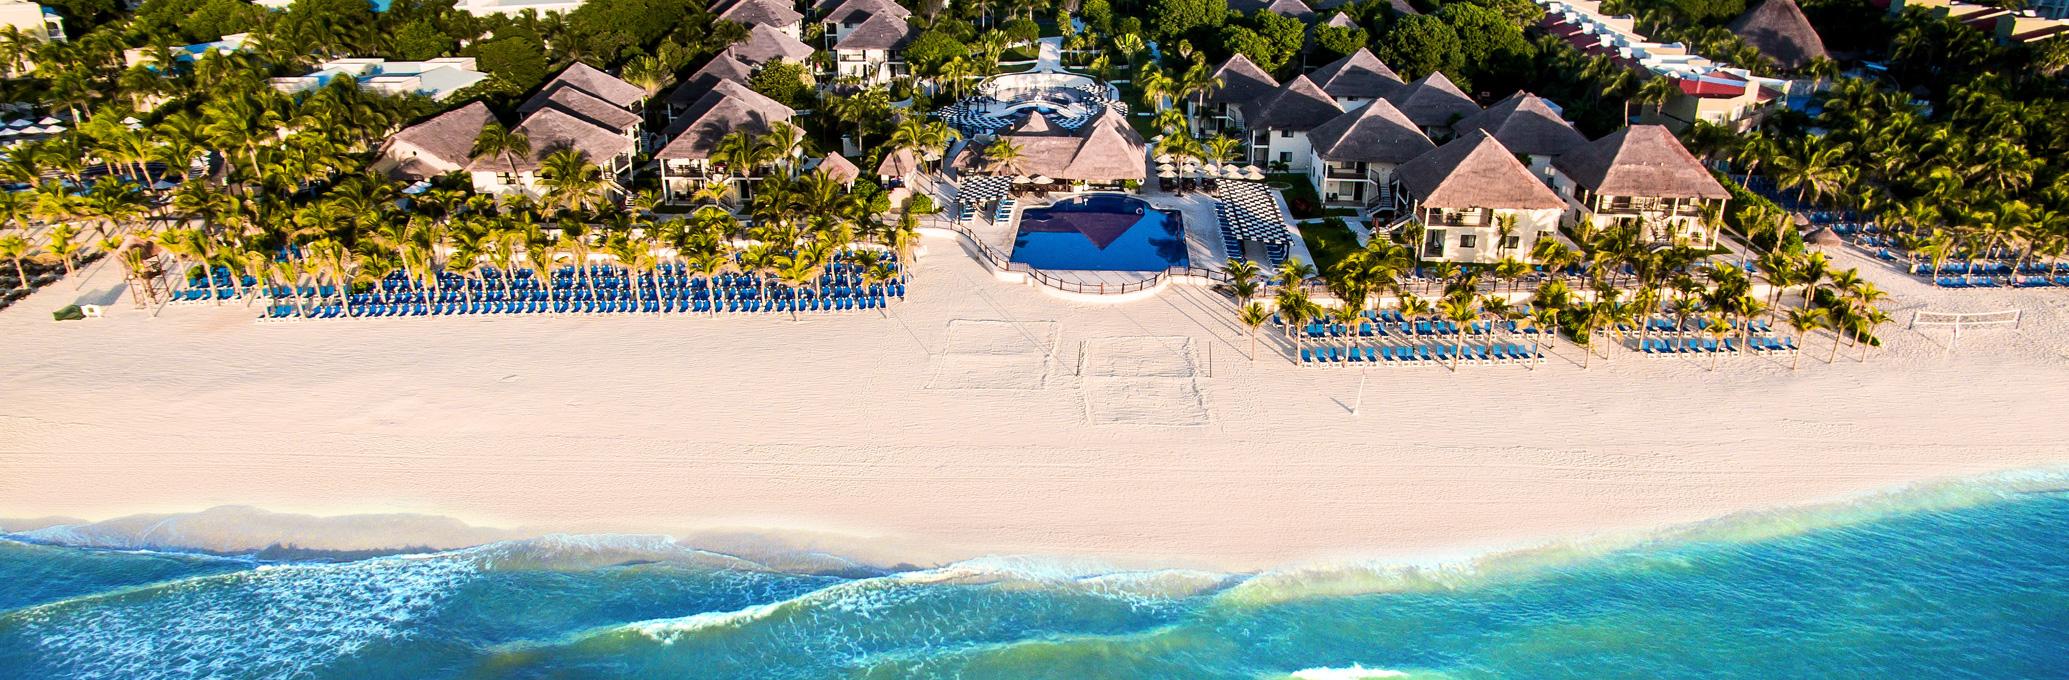 Best Playa del Carmen hotels: Allegro Playacar